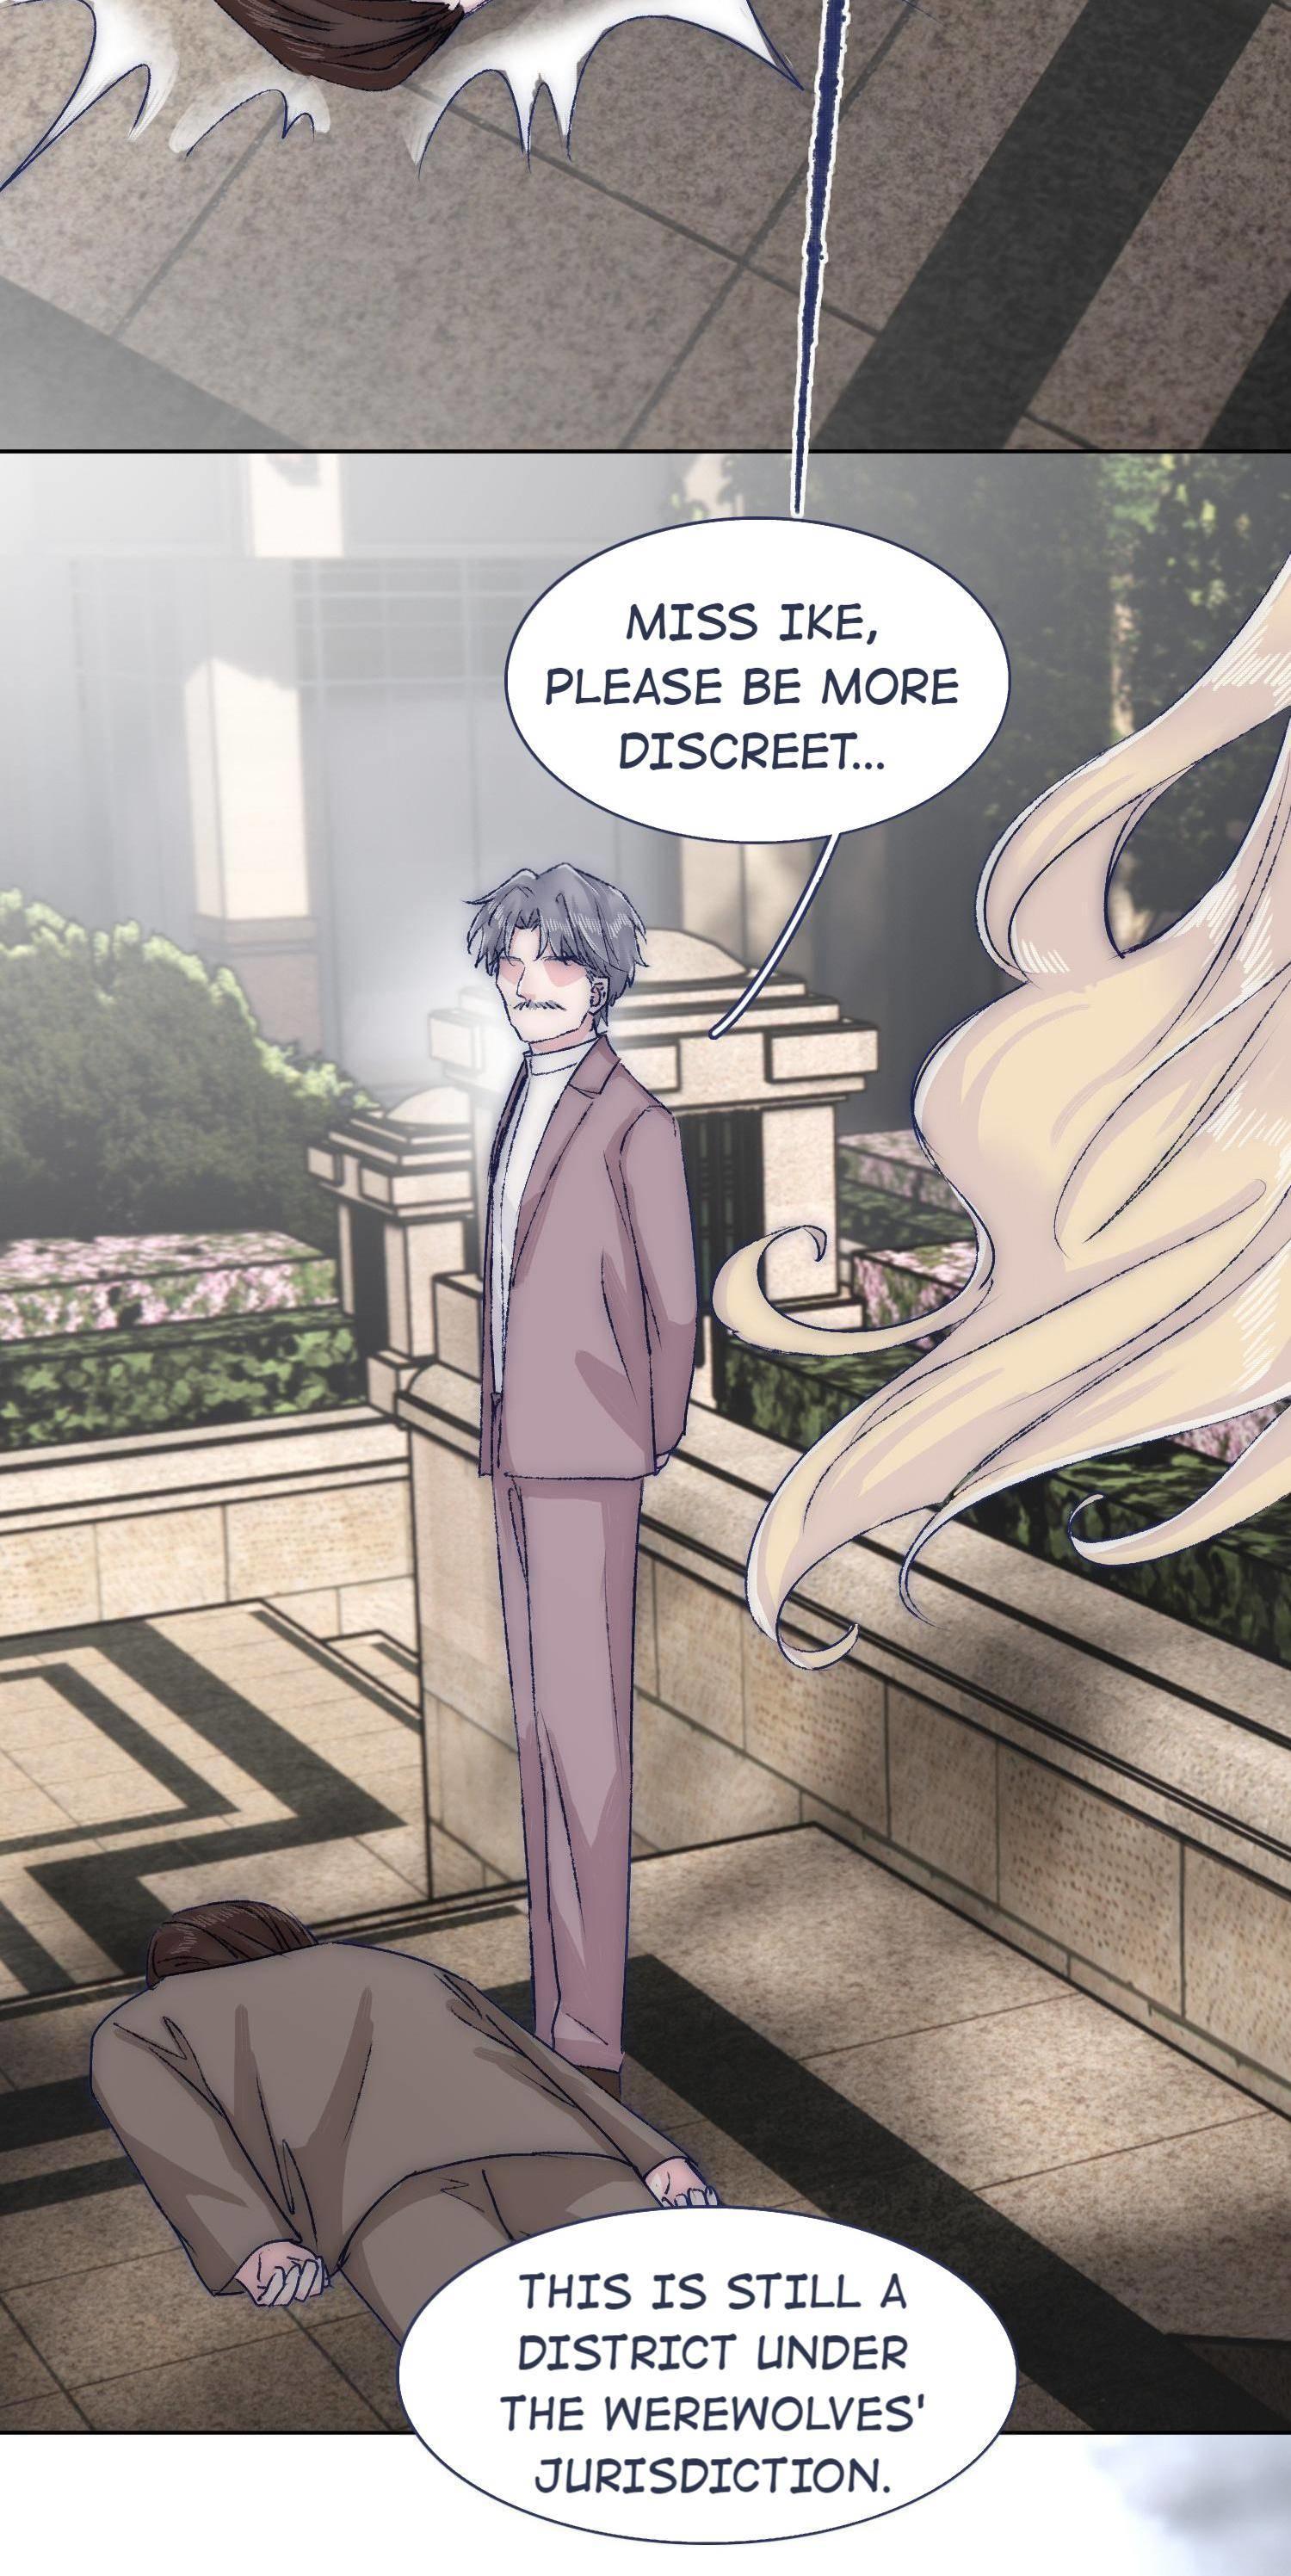 I Offer My Neck To You Chapter 72 page 5 - Mangakakalot